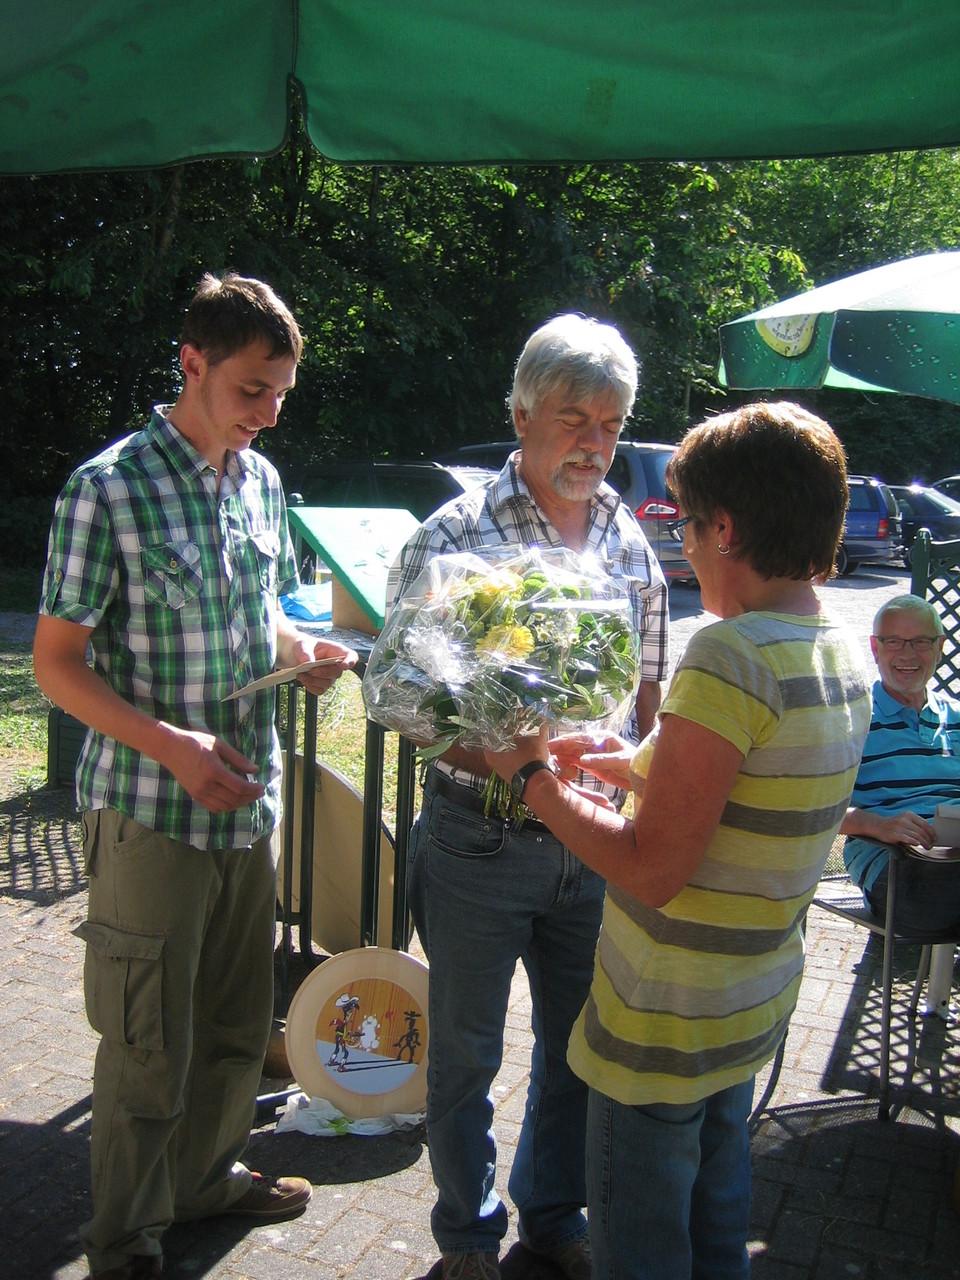 Proklamation der Königsfamilie 2014 - 1. Schützenliesel Brigitte Schmidt